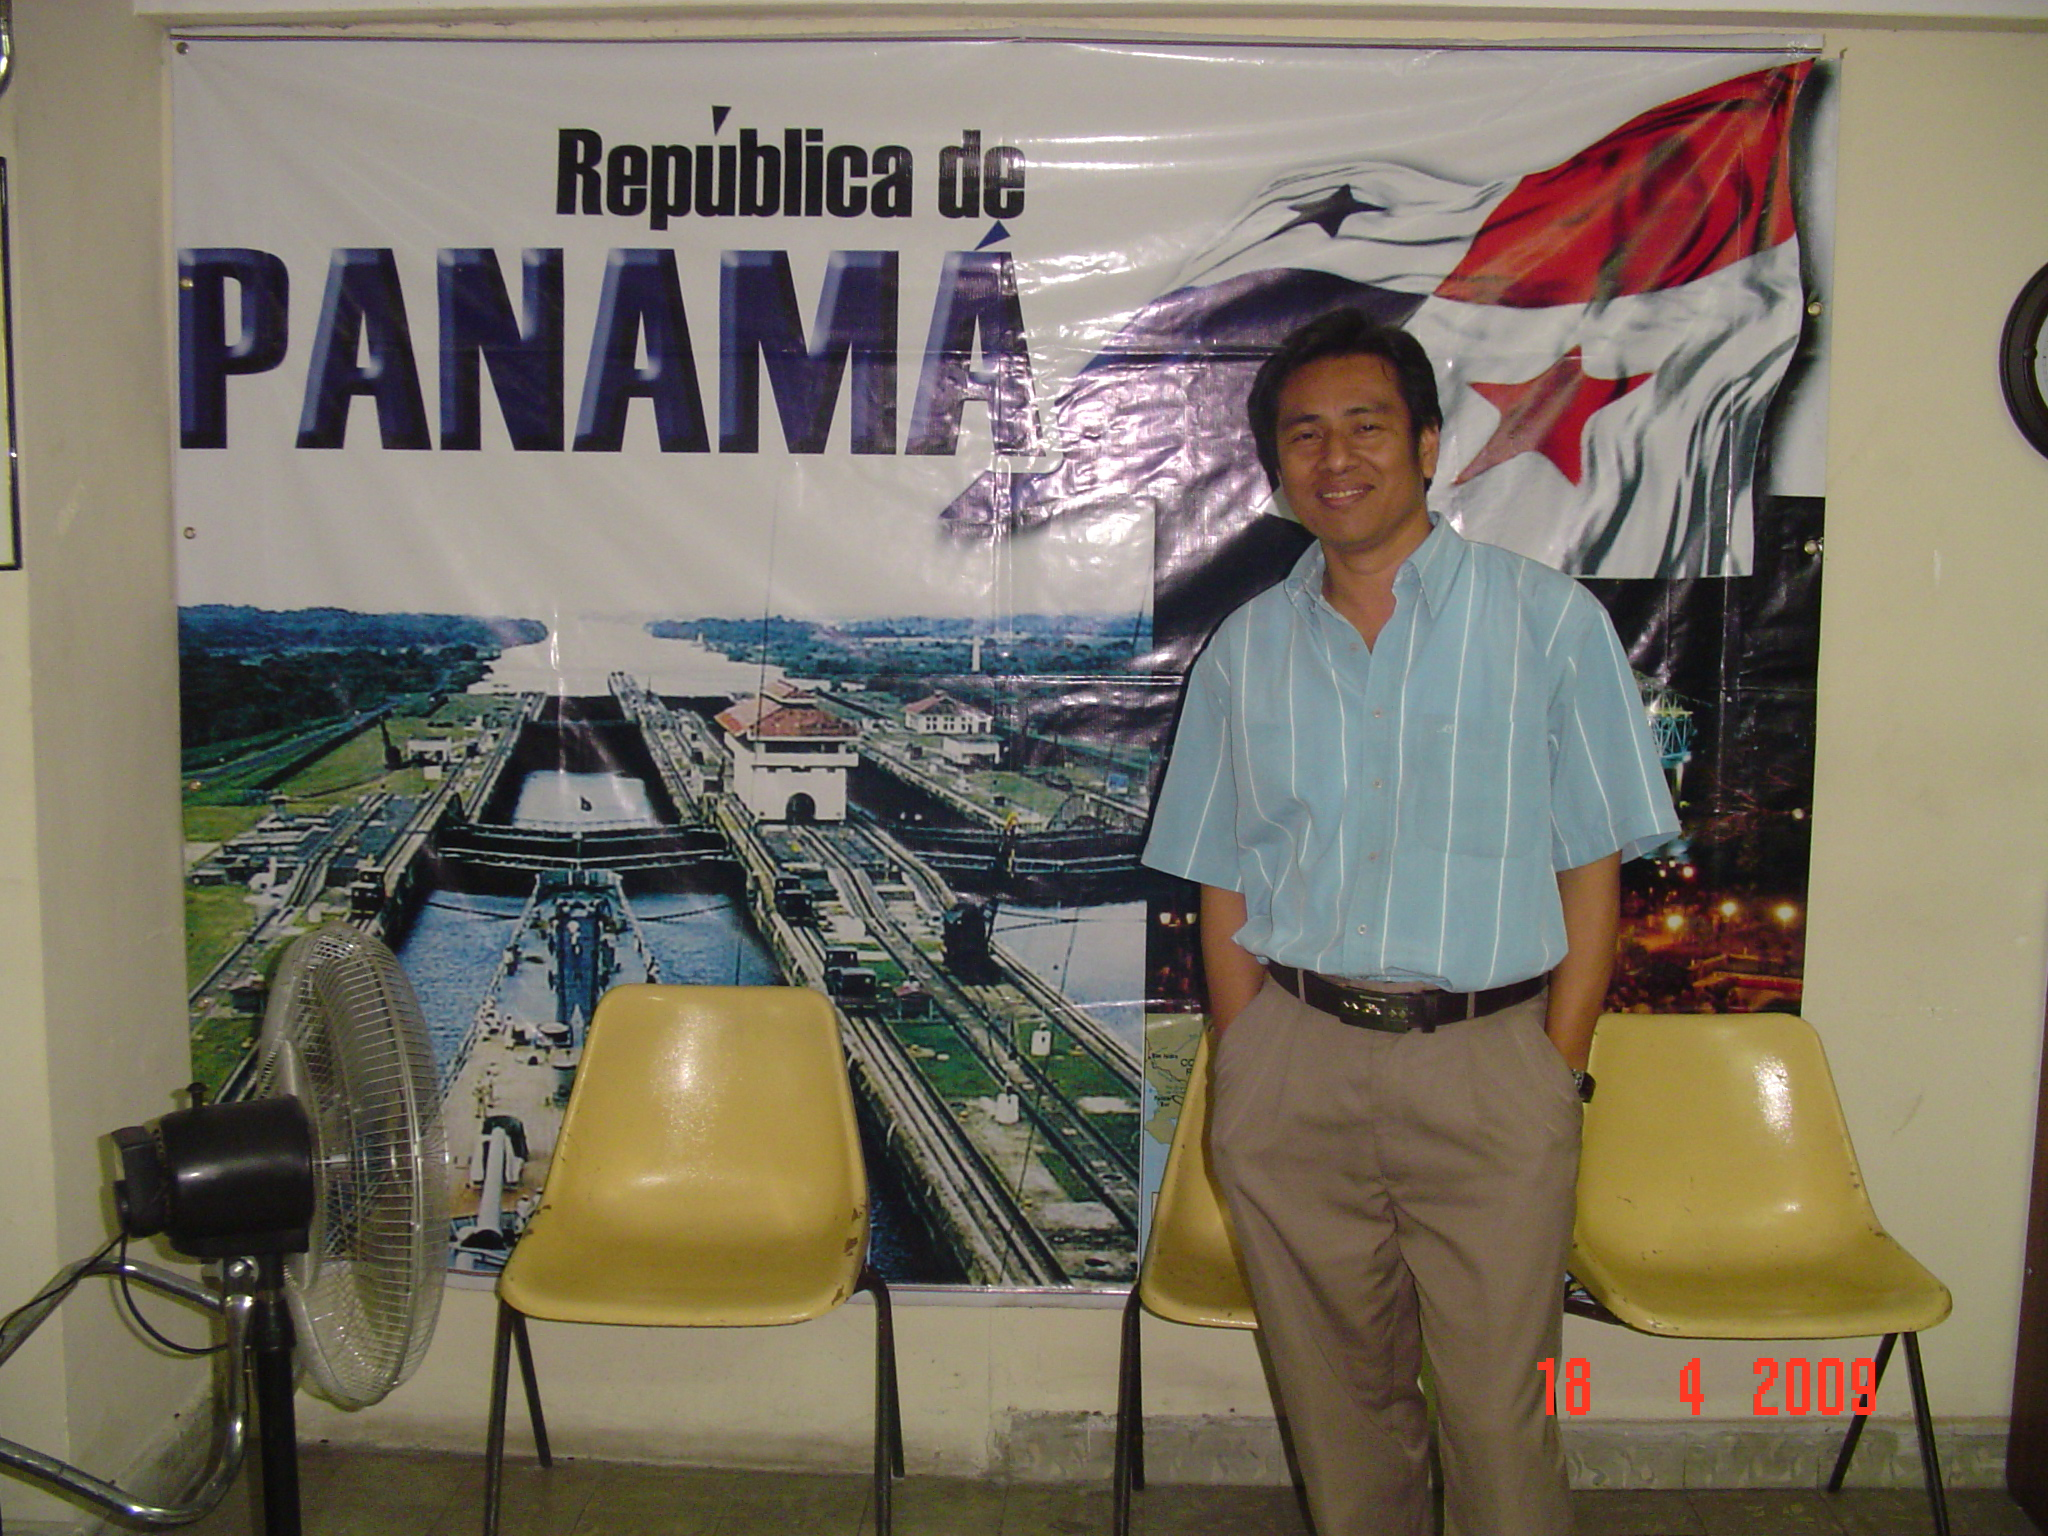 Pablo Sandino